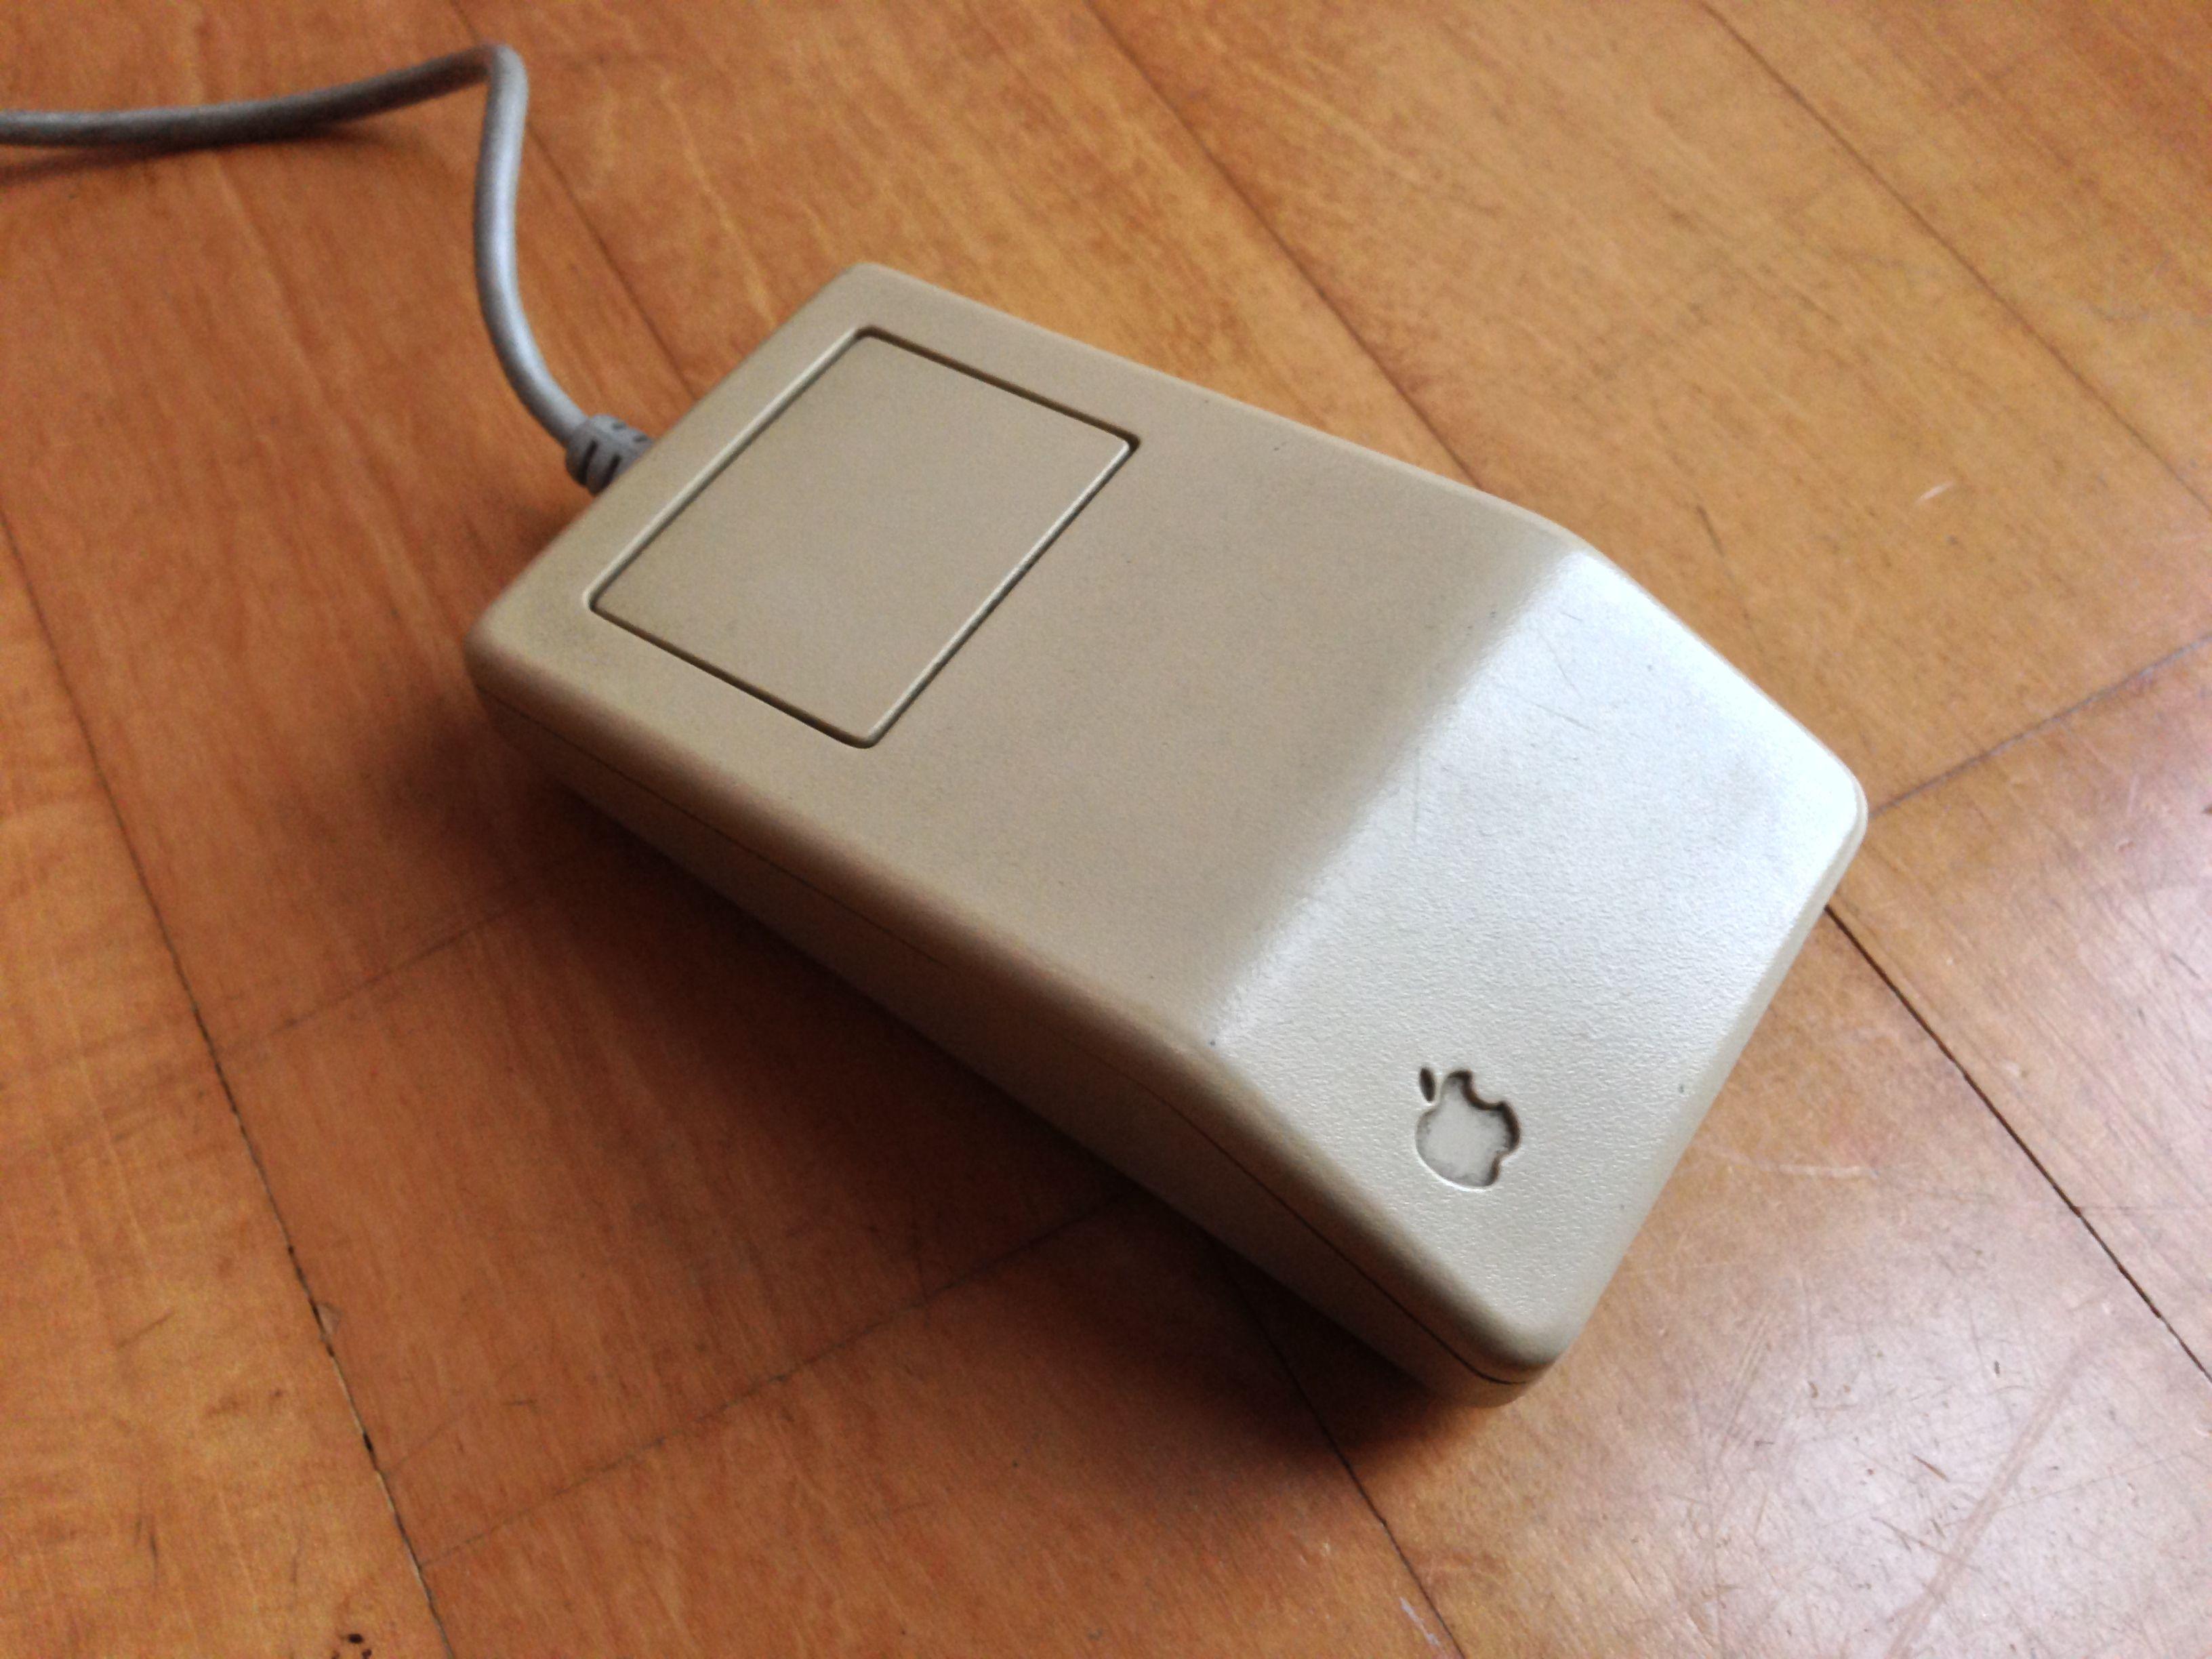 Apple Desktop Bus Mouse Apple Desktop Apple Computer Apple Mac